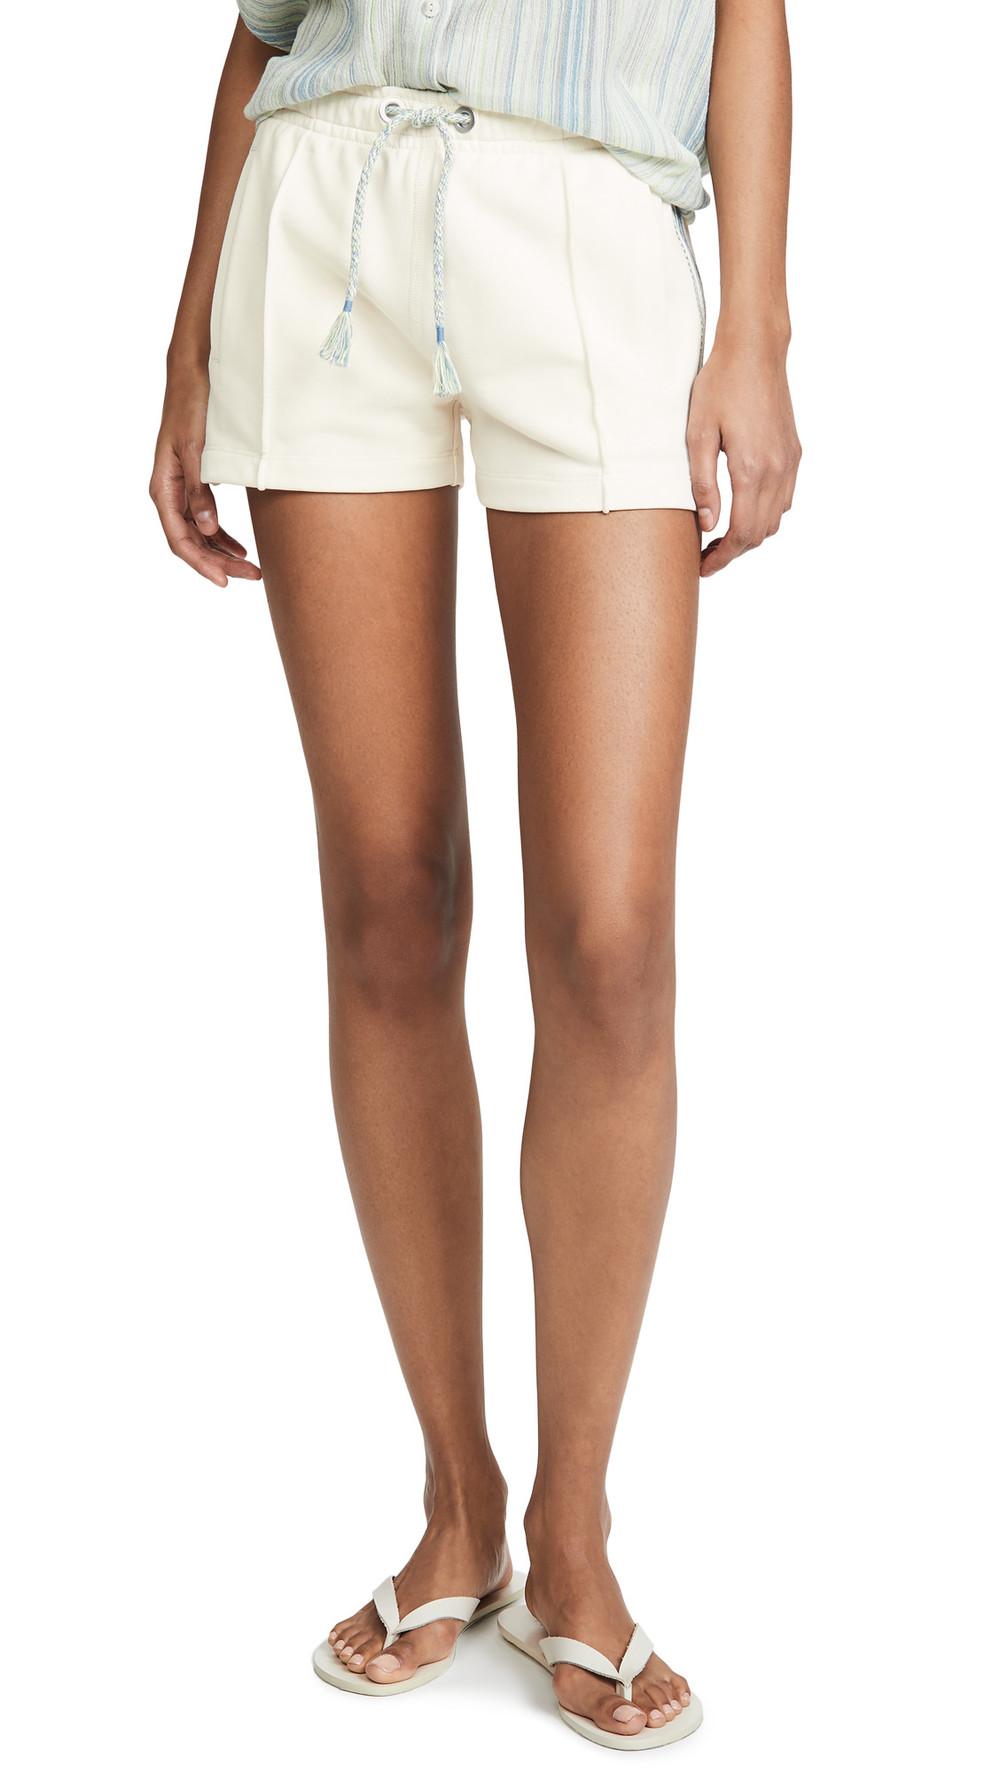 Rag & Bone/JEAN Molly Striped Trim Shorts in ivory